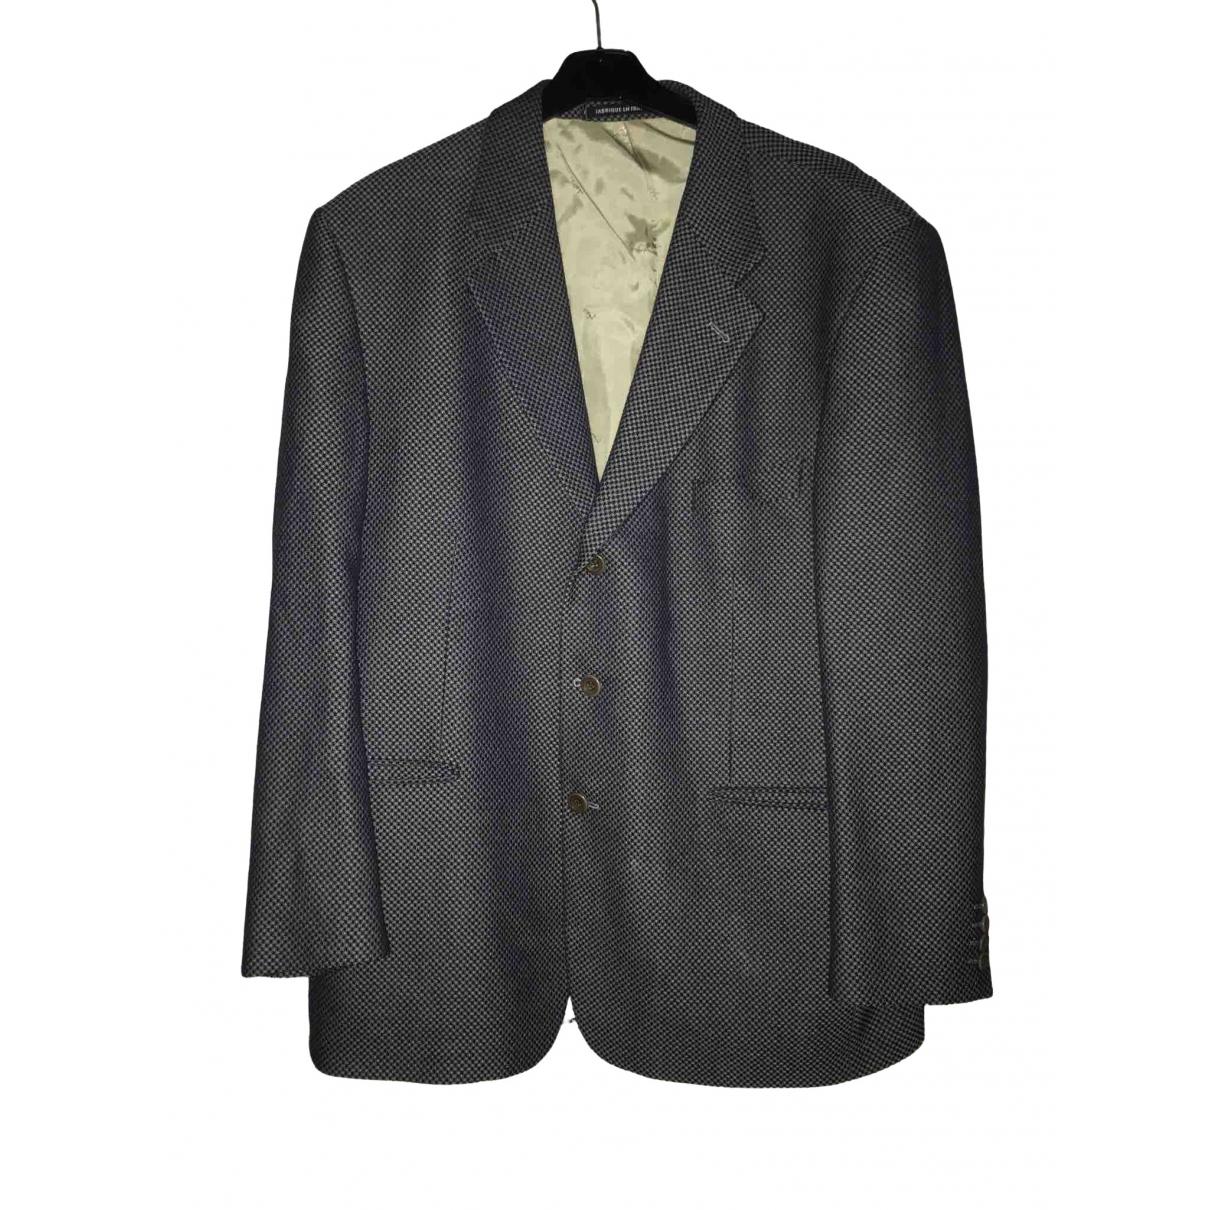 Yves Saint Laurent \N Grey Cotton jacket  for Men L International